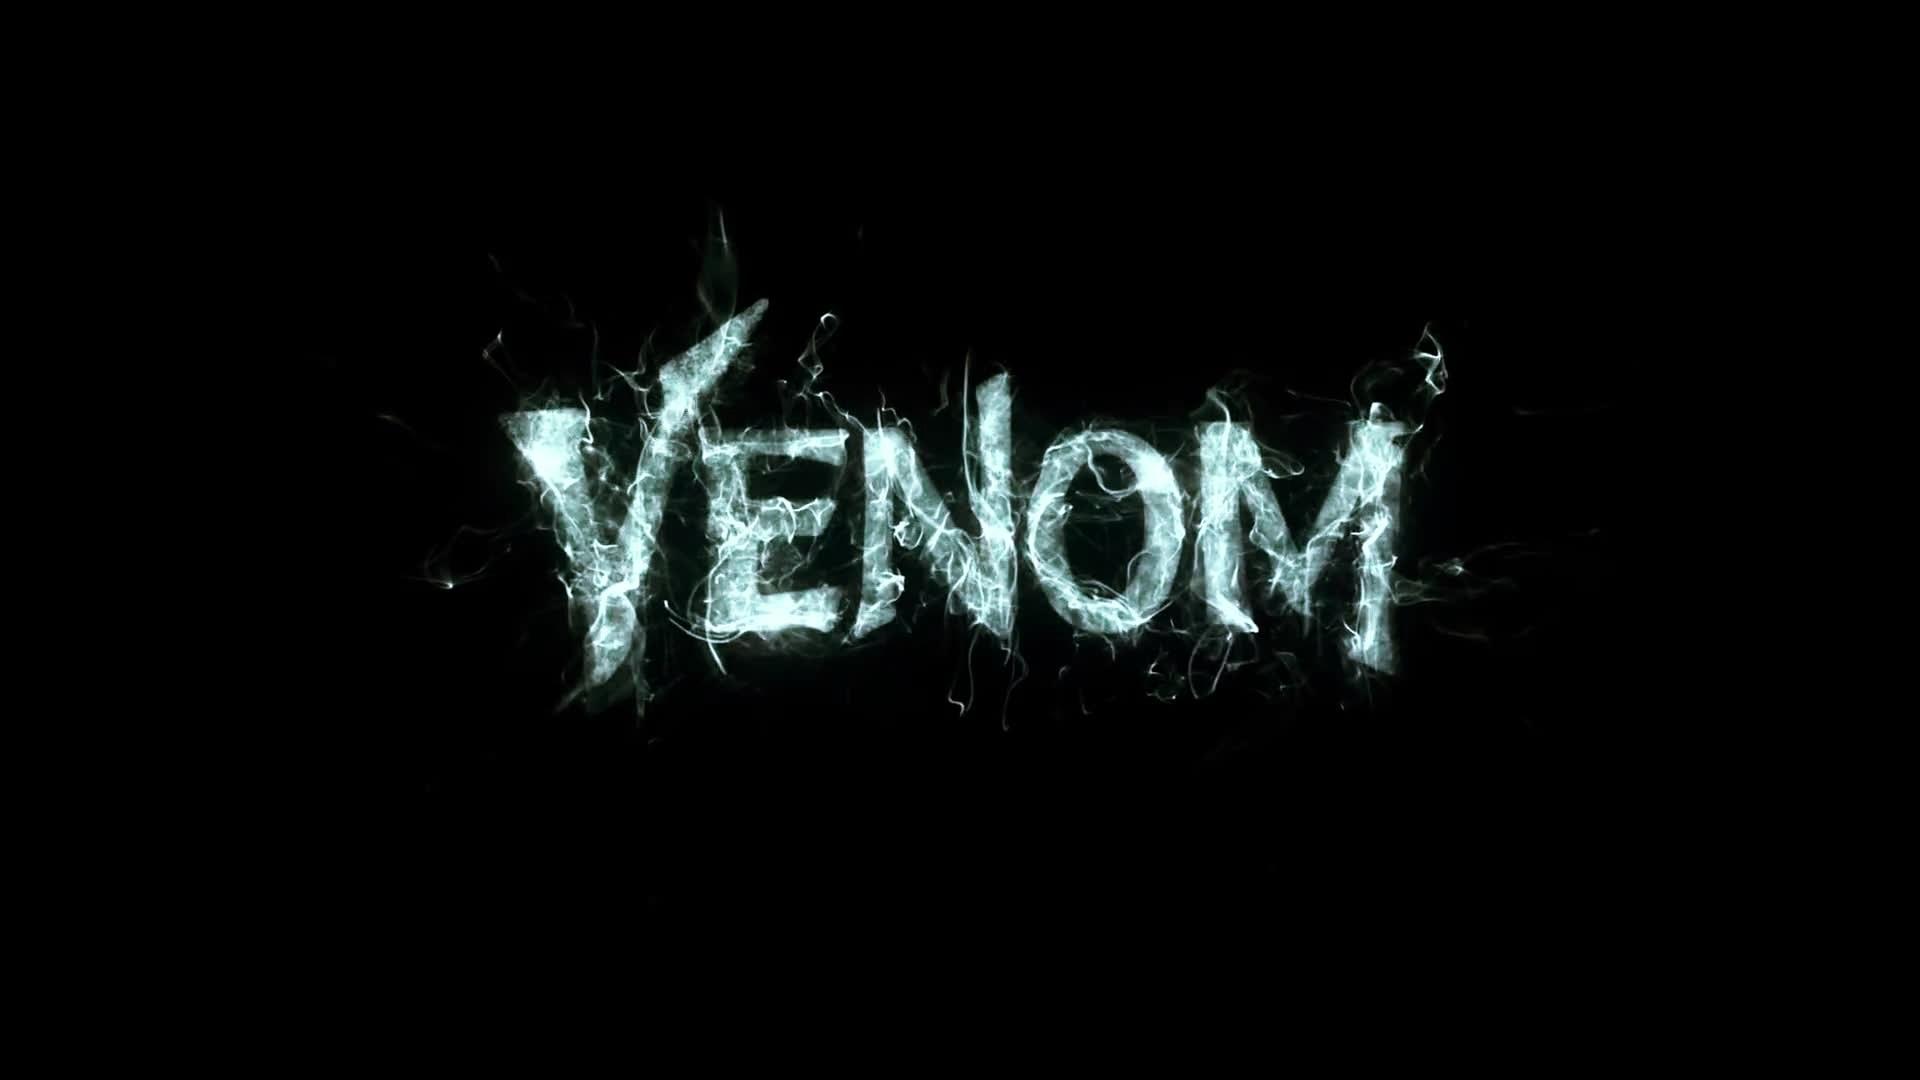 Venom movie background 5